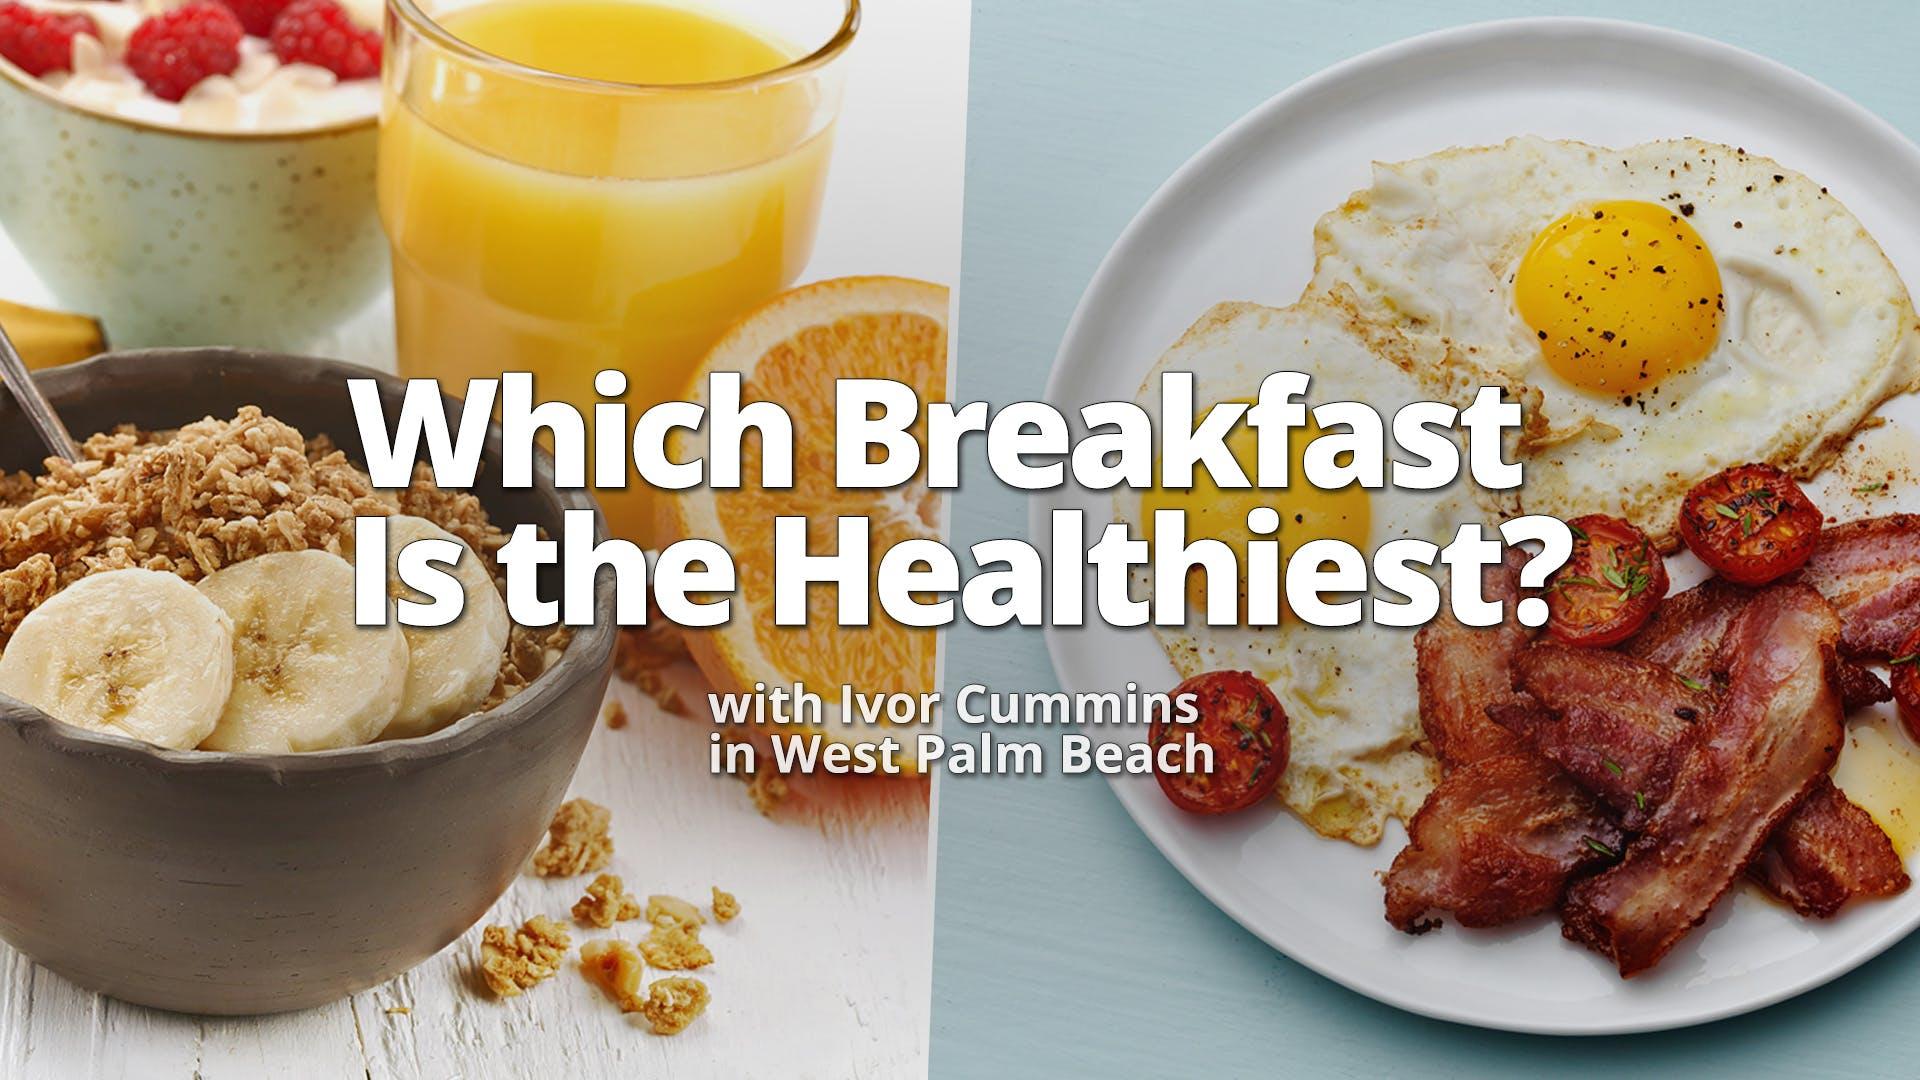 Which breakfast is healthier?